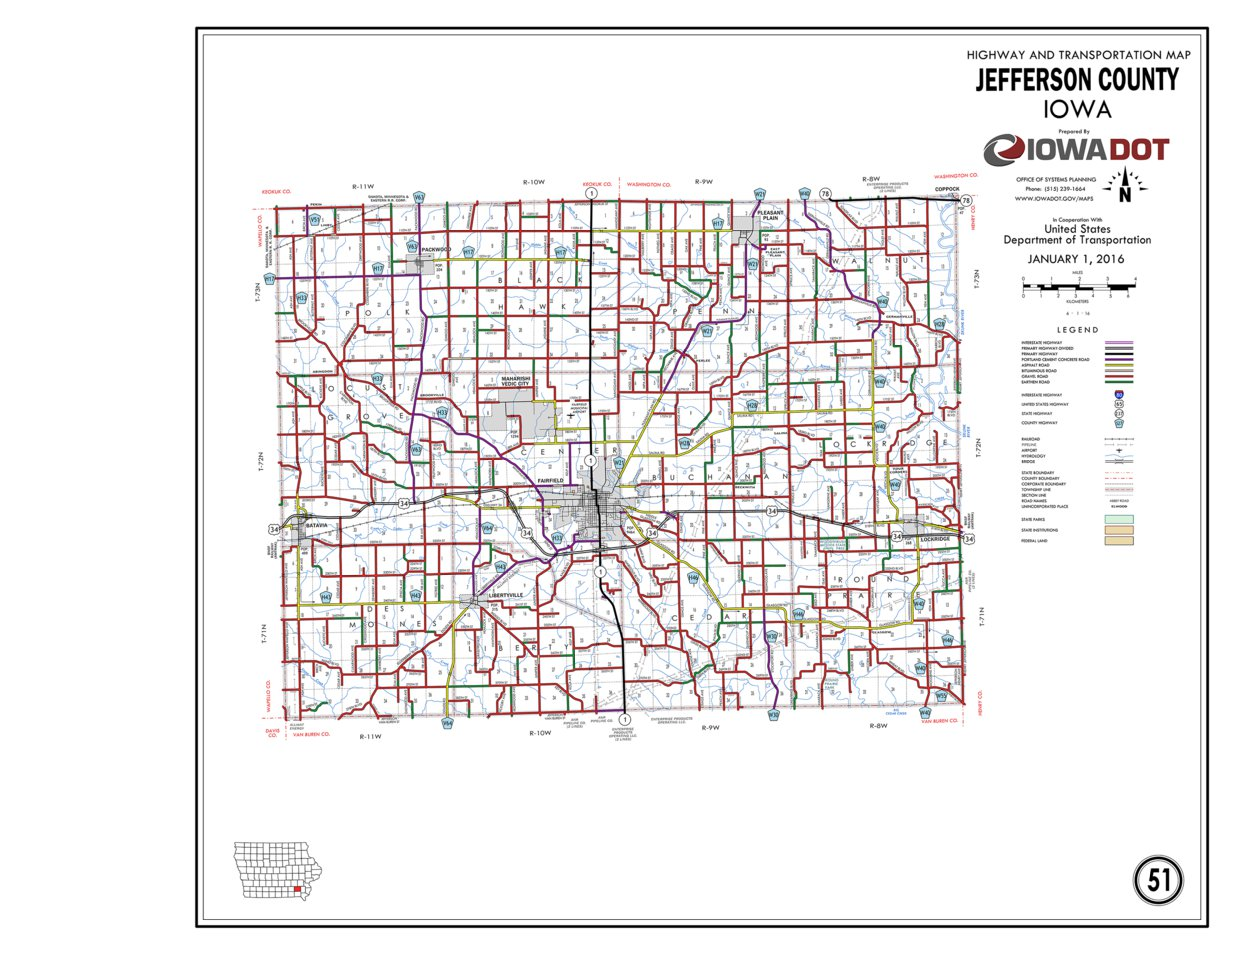 Jefferson County Iowa Map.Jefferson County Iowa Iowa Department Of Transportation Avenza Maps